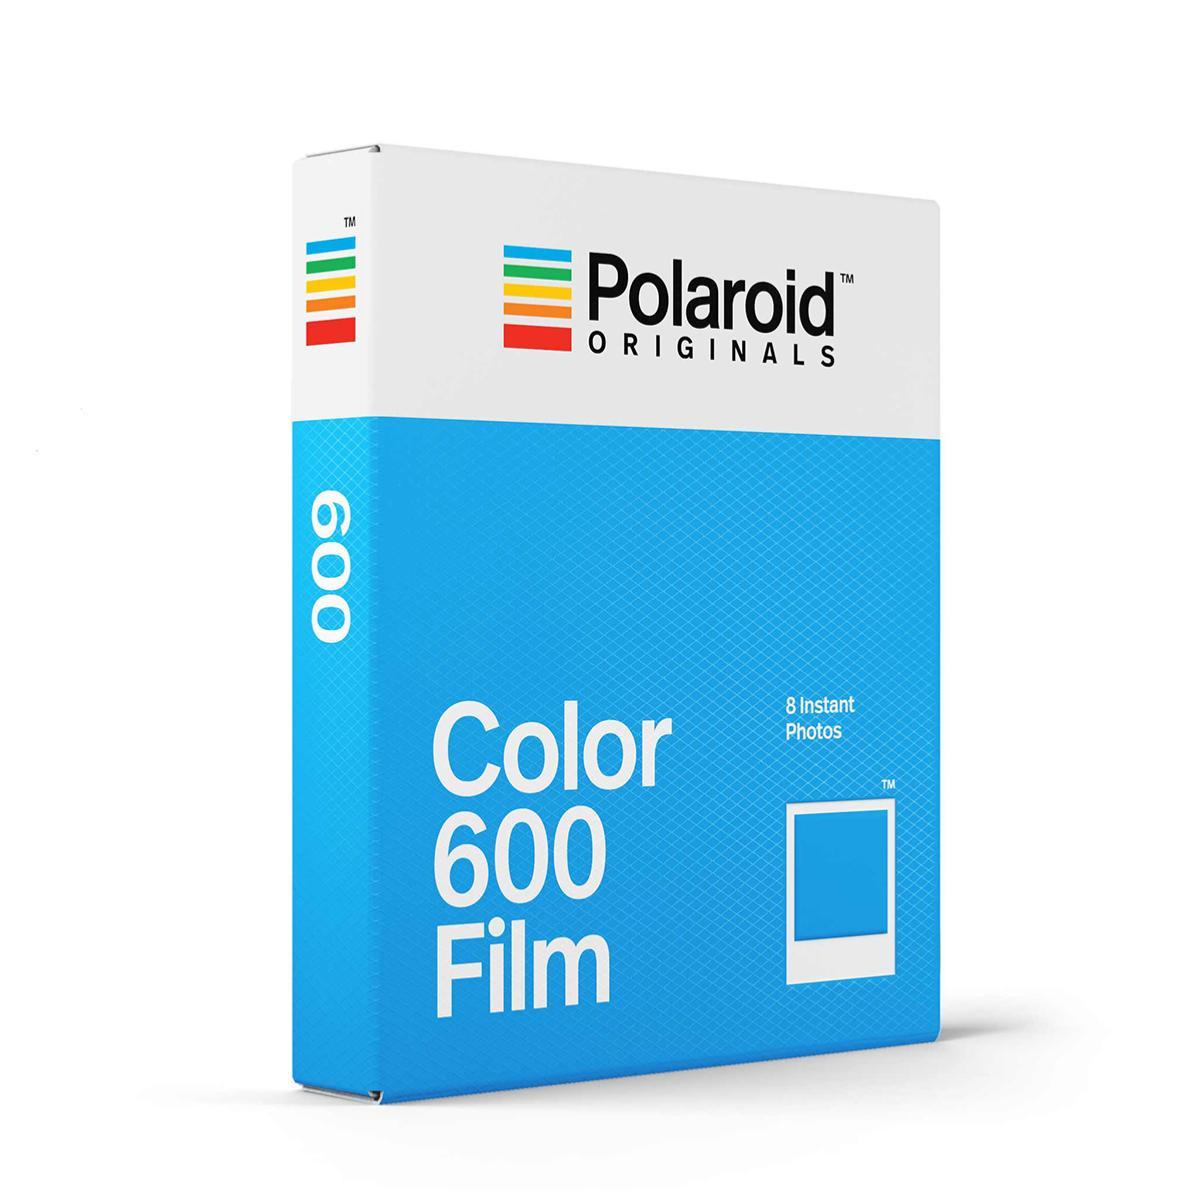 polaroid originals film 600 couleur prophot. Black Bedroom Furniture Sets. Home Design Ideas